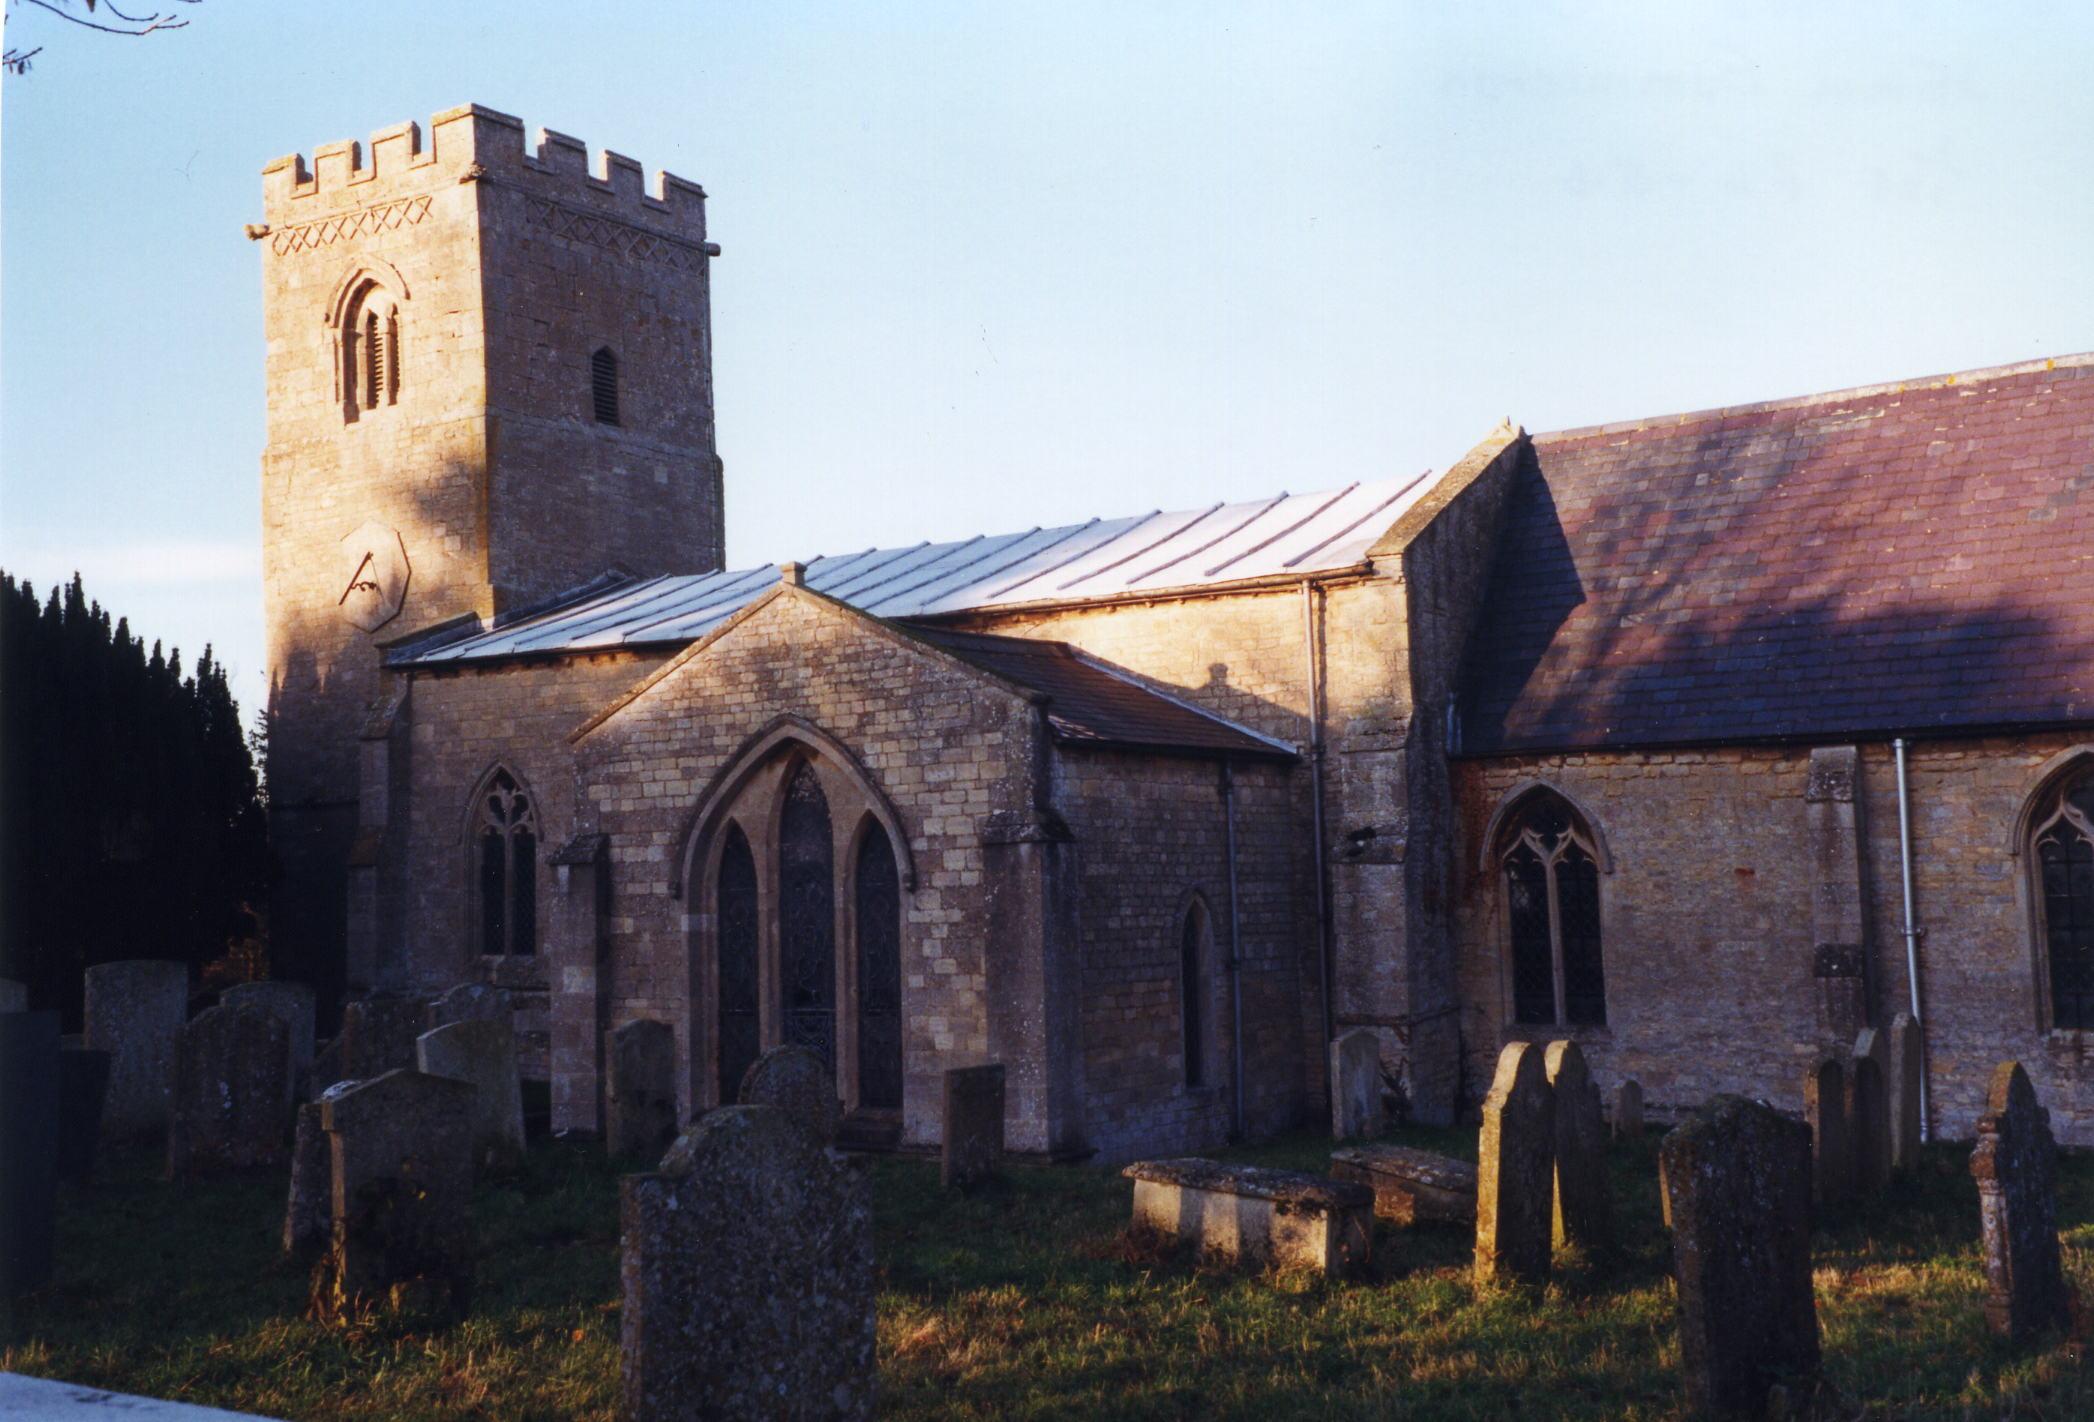 Castle Bytham St. James parish church